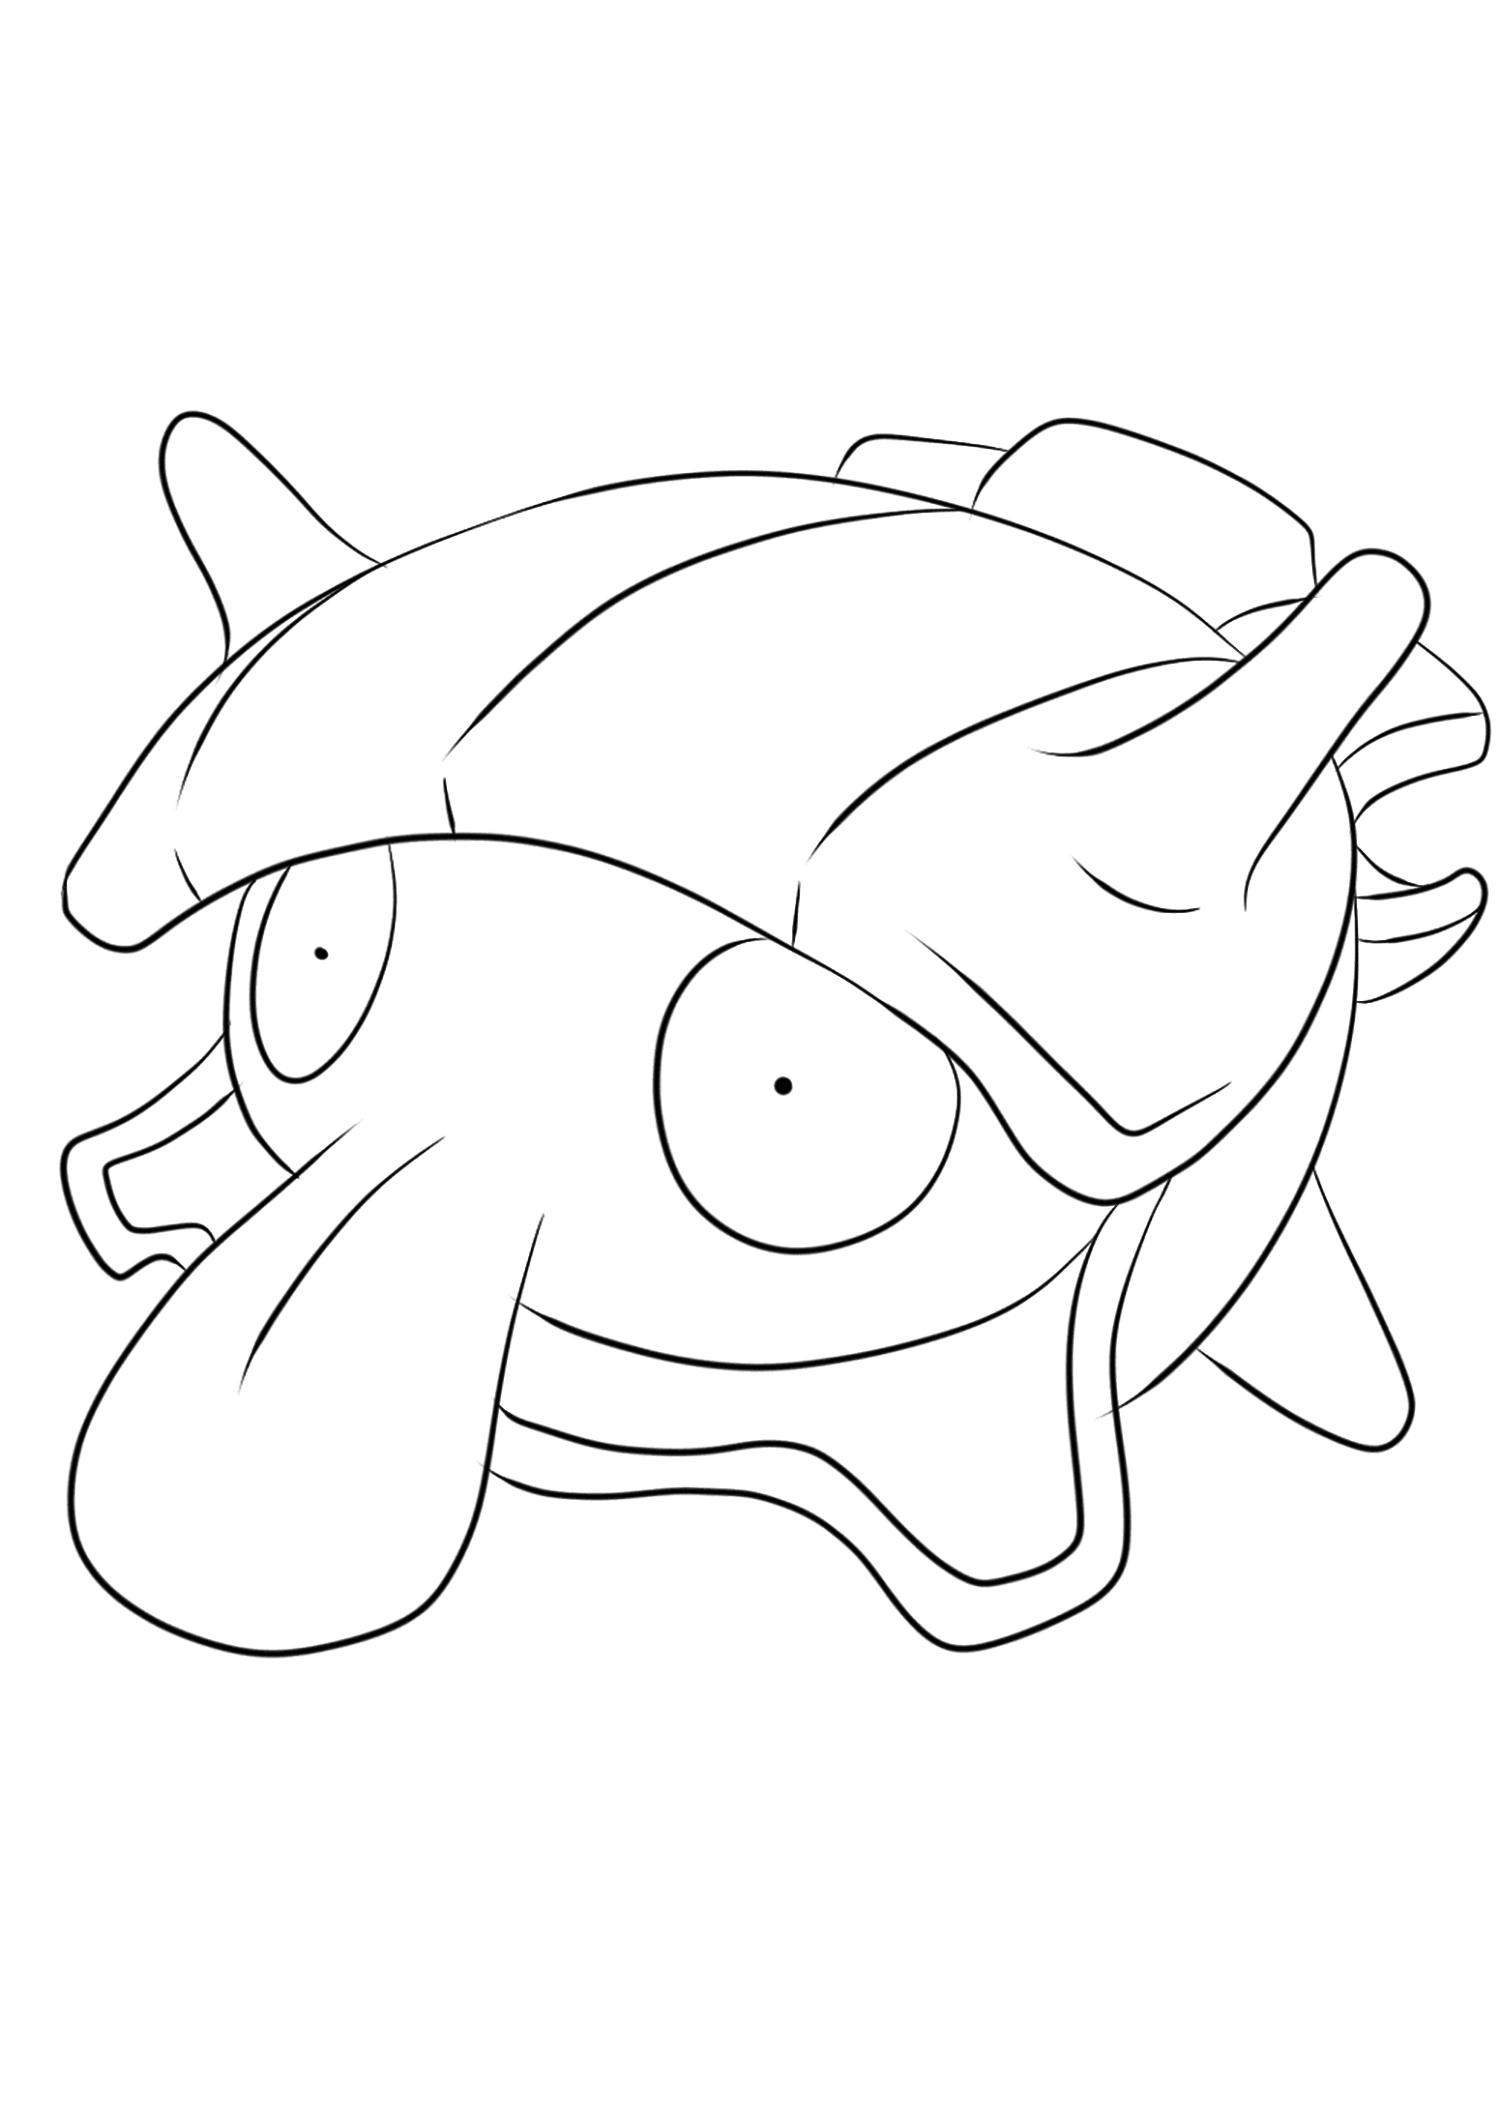 <b>Shellder</b> (No.90) : Pokemon (Generation I)